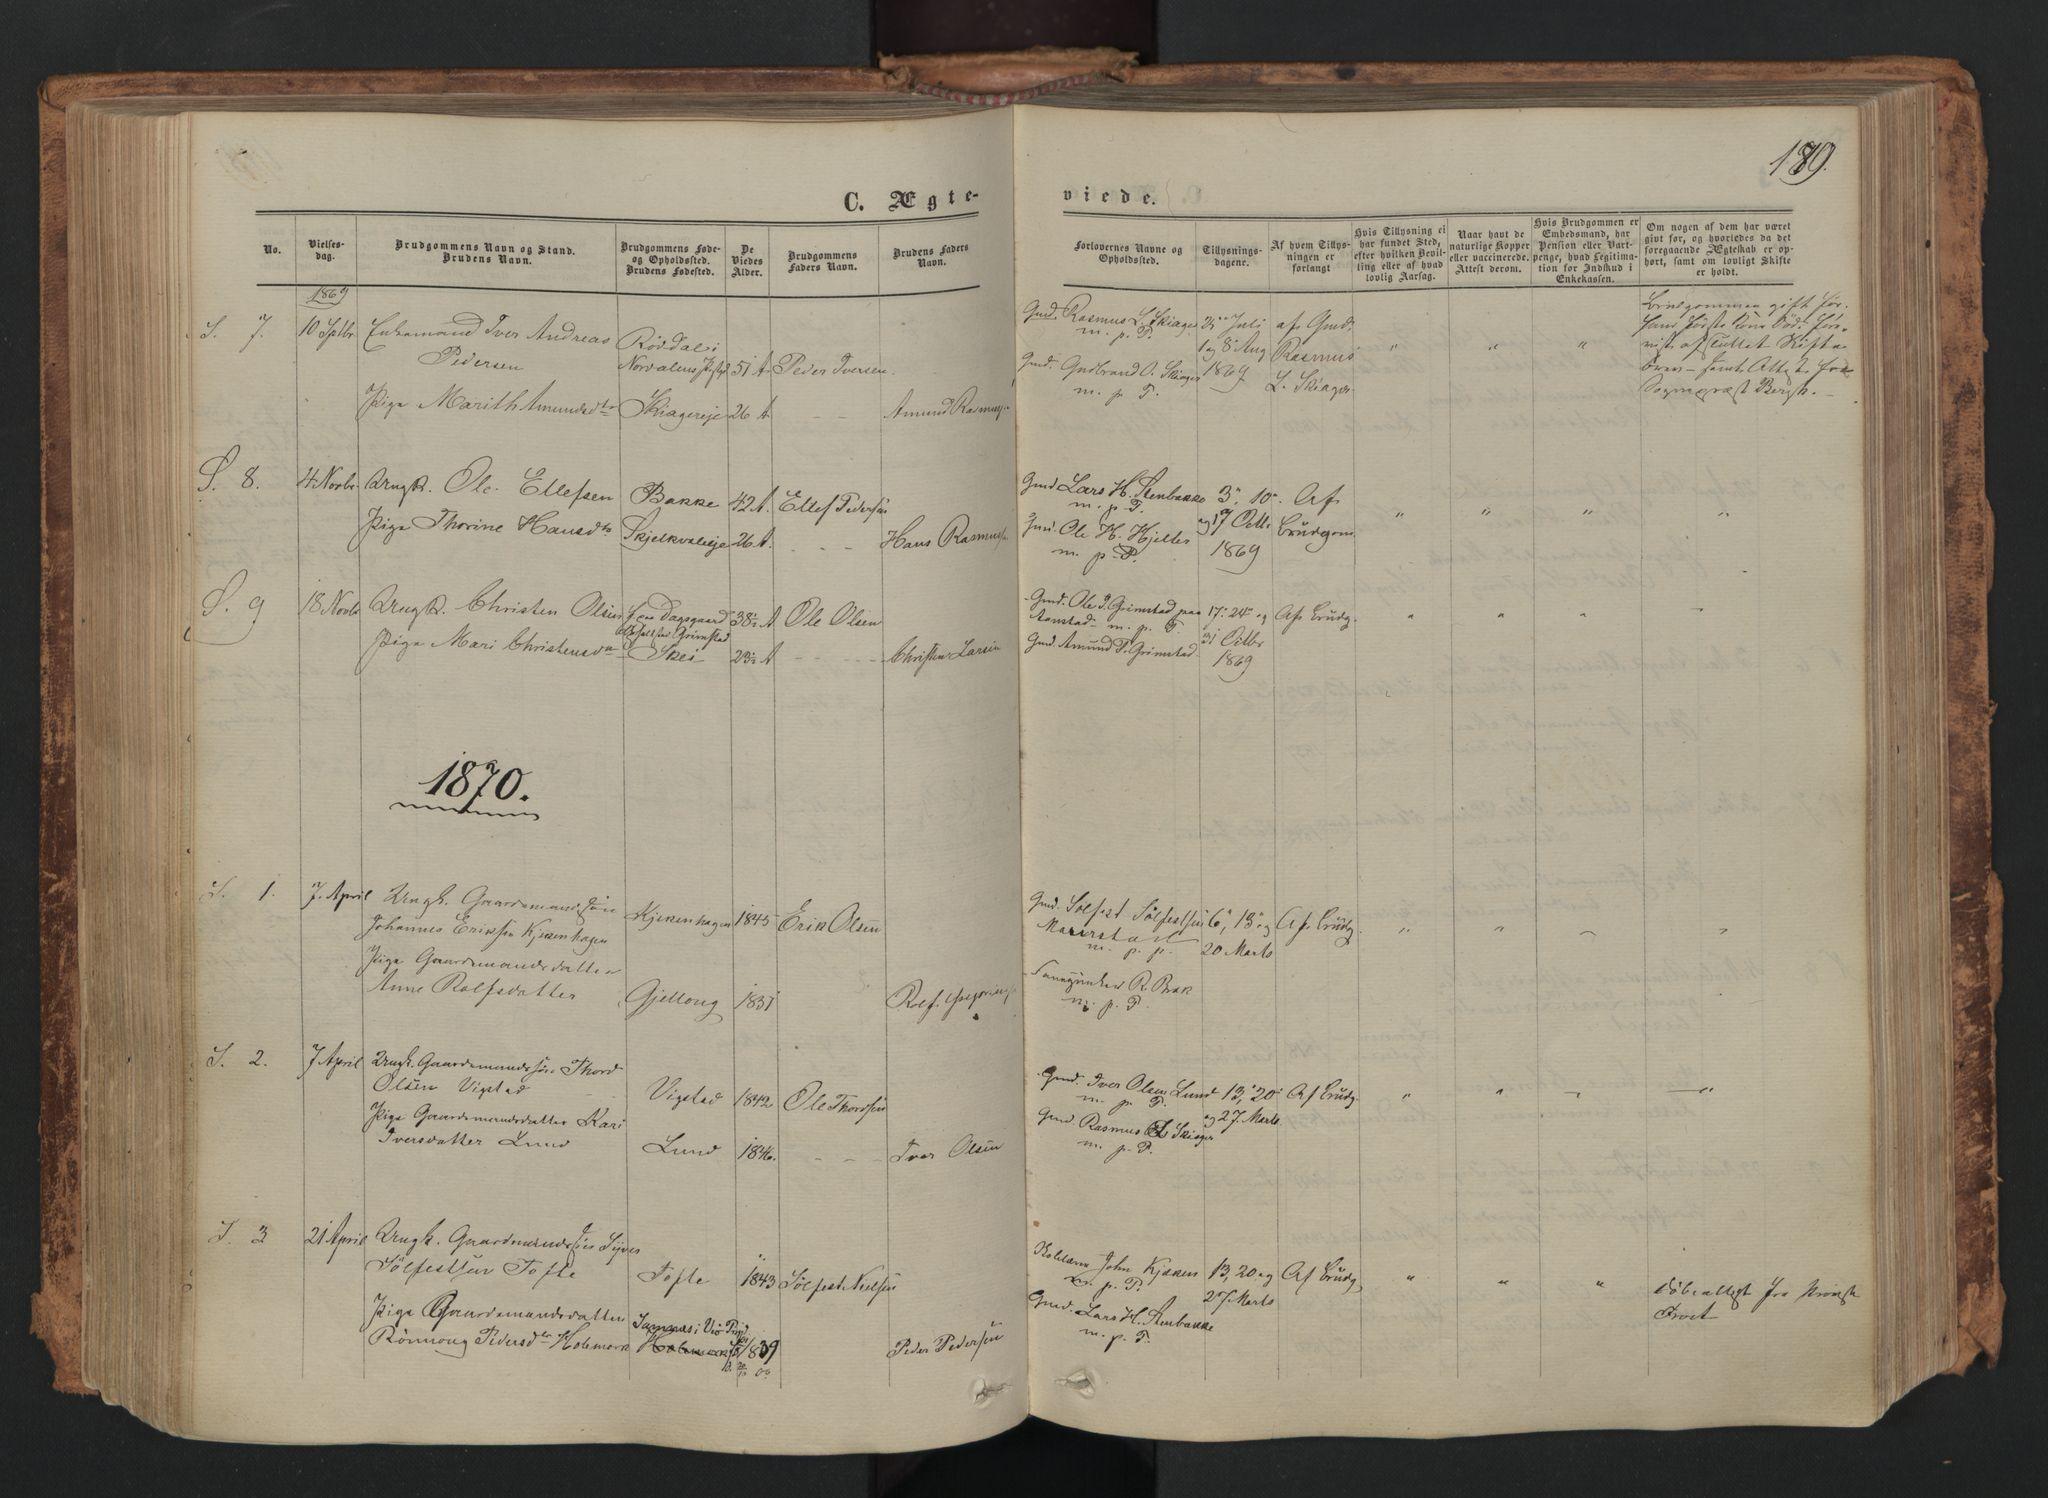 SAH, Skjåk prestekontor, Ministerialbok nr. 1, 1863-1879, s. 179